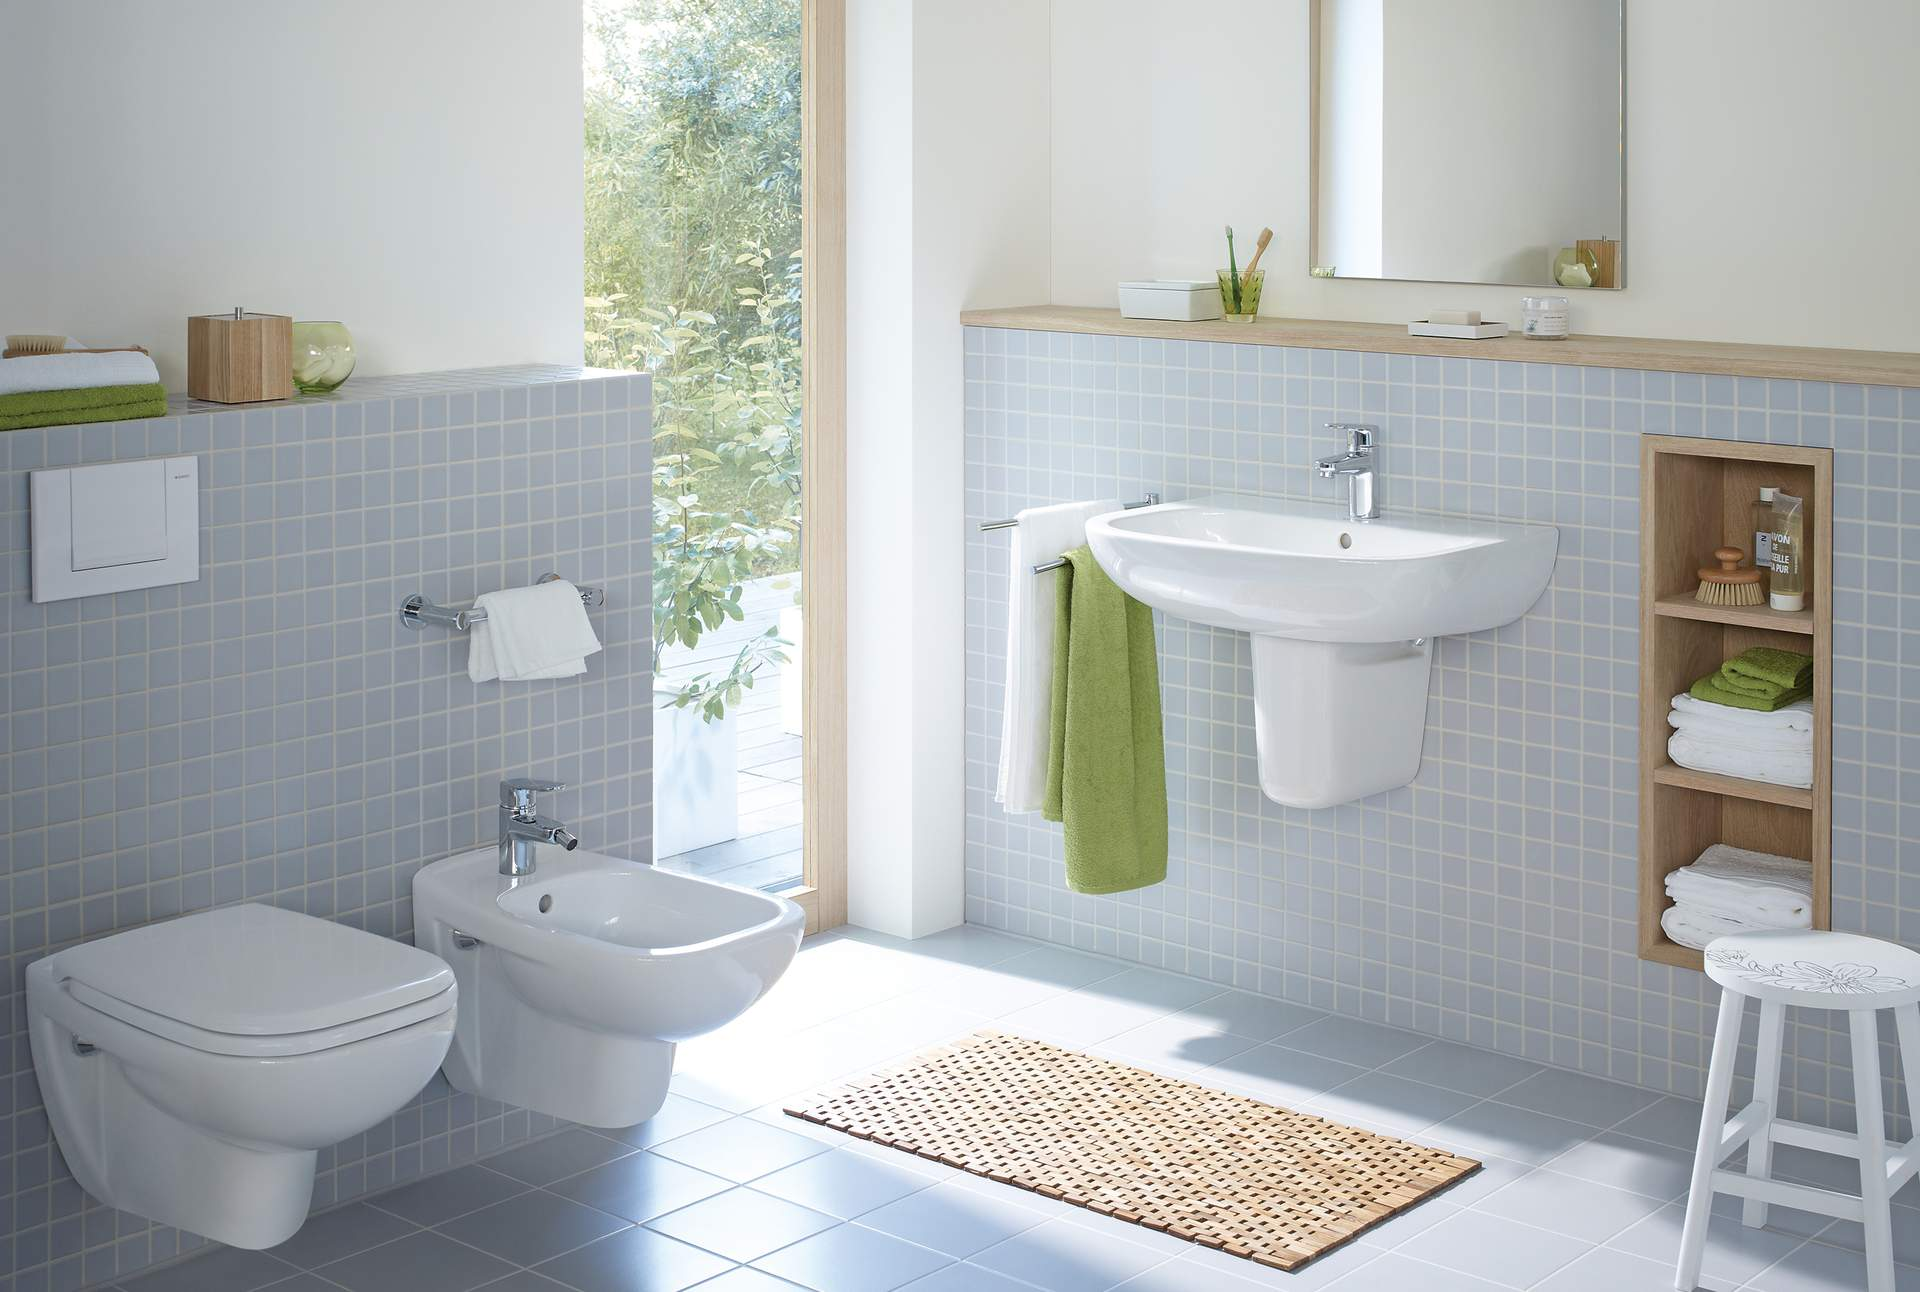 Badkamer Meubel Duravit : Badkamermeubel duravit duravit durastyle toilet beniers badkamers